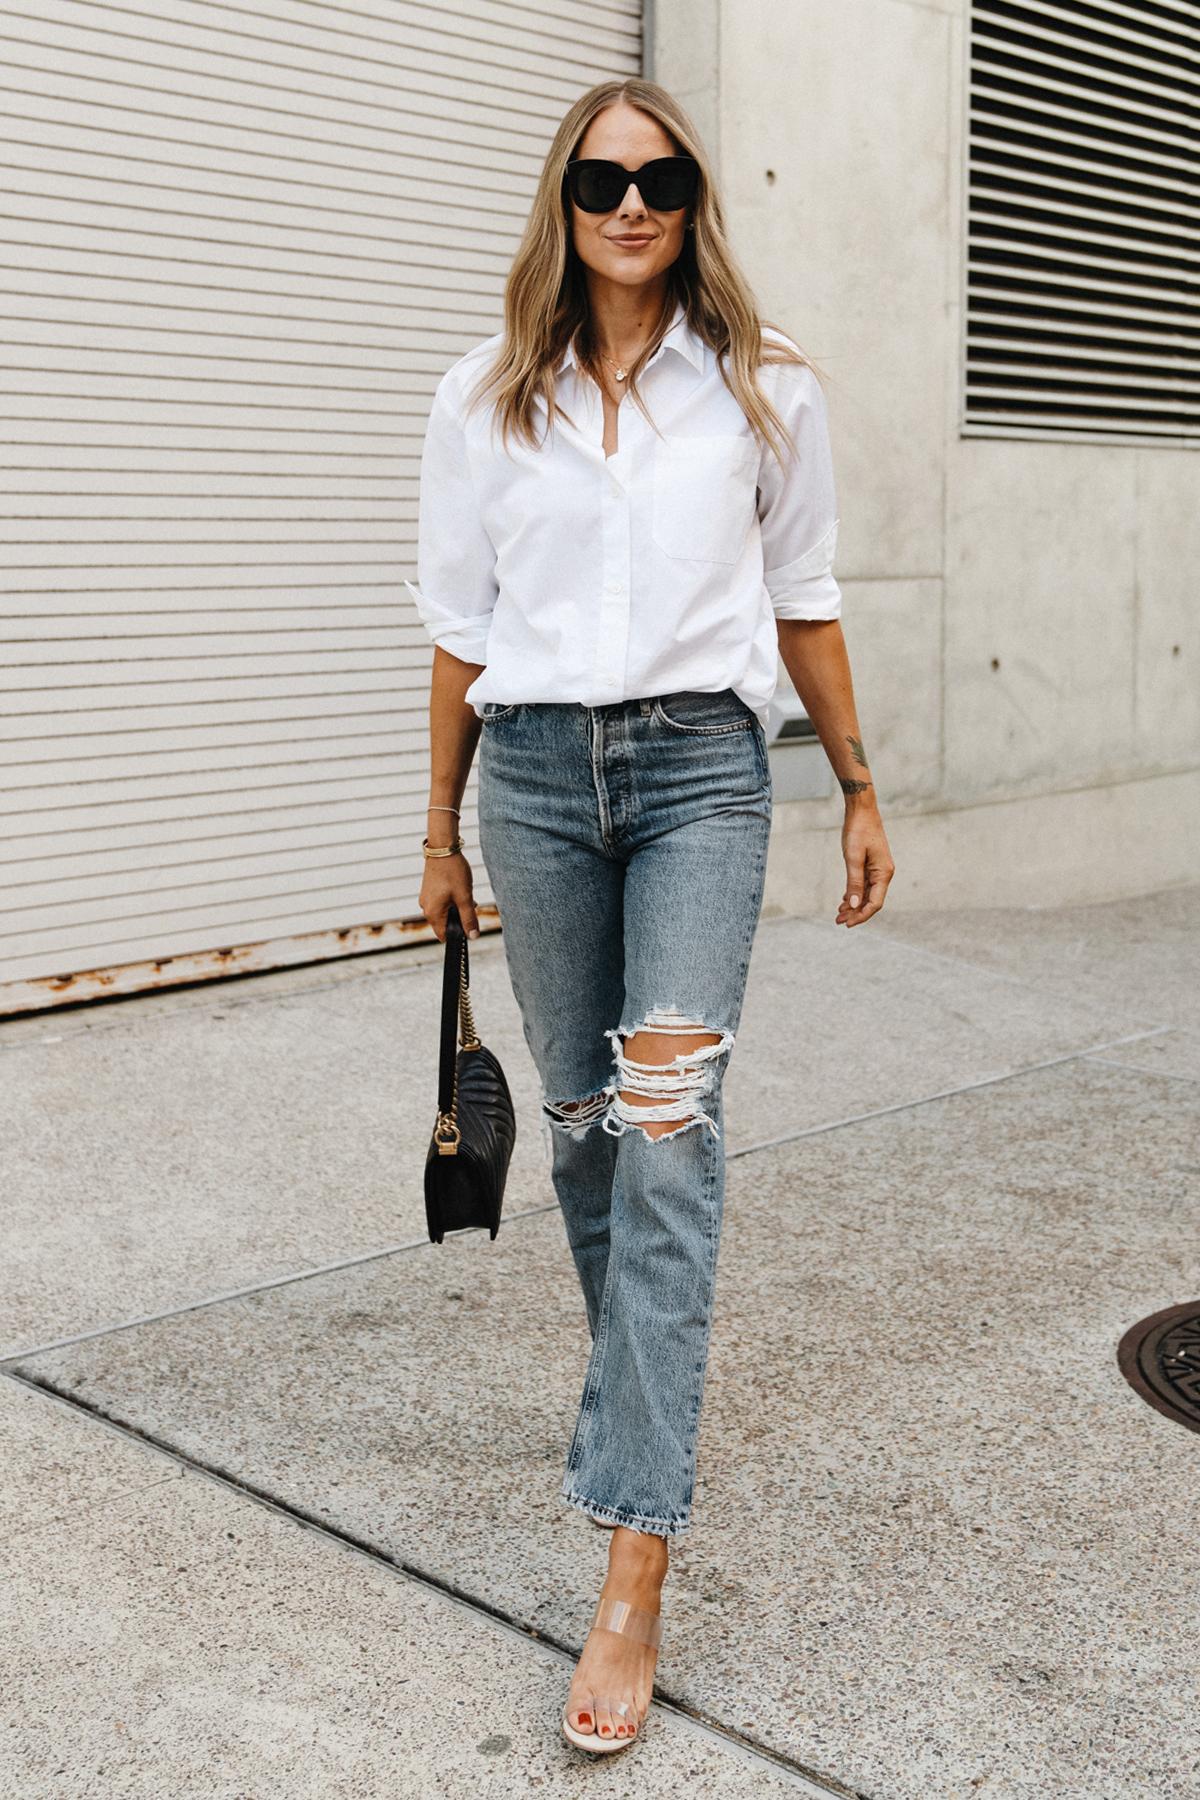 Fashion Jackson Wearing Jenni Kayne White Button Up Shirt AGOLDE Ripped Jeans Schutz Clear Heeled Sandals Street Style 1